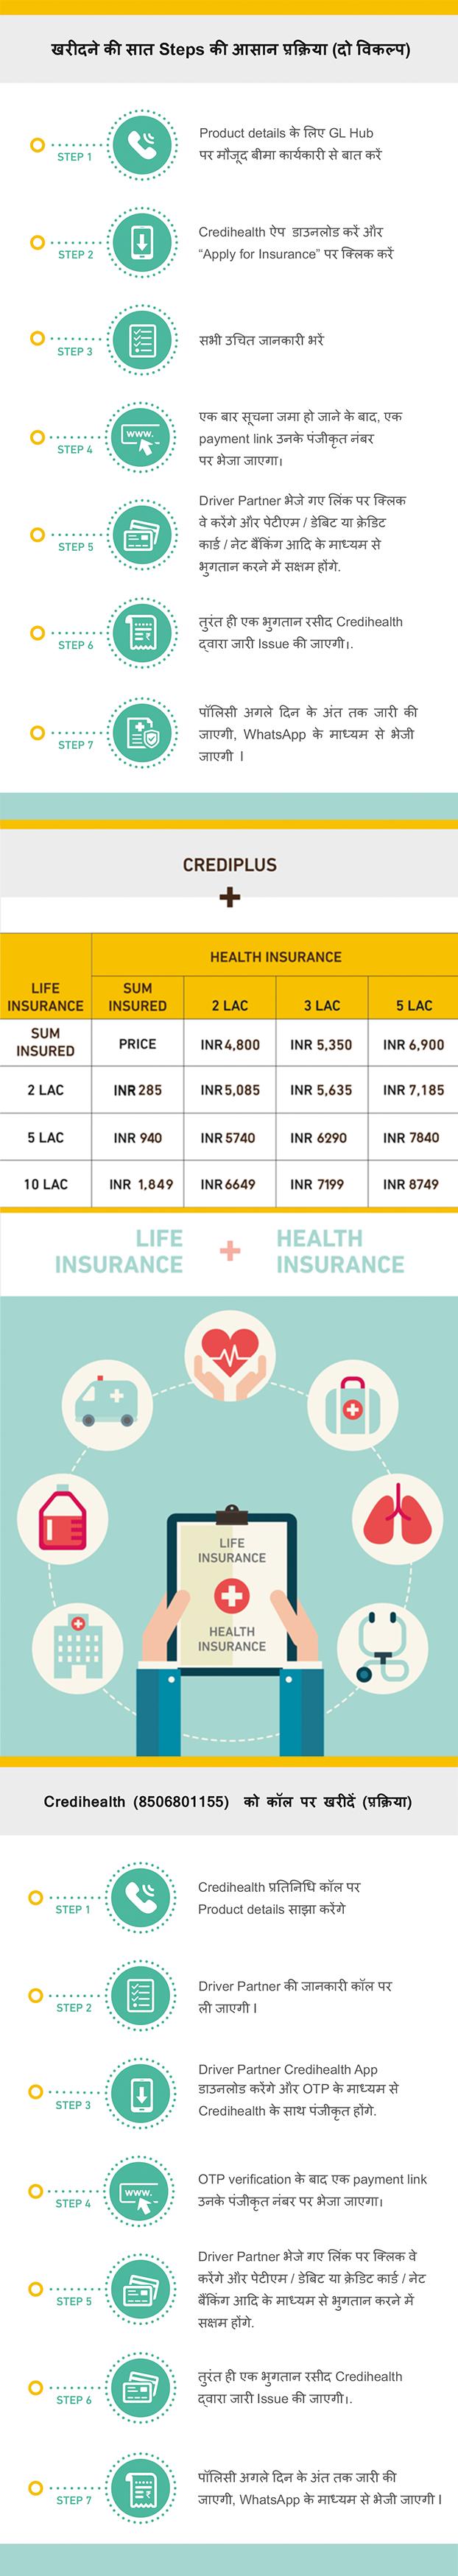 Health Insurance For Uber Driver